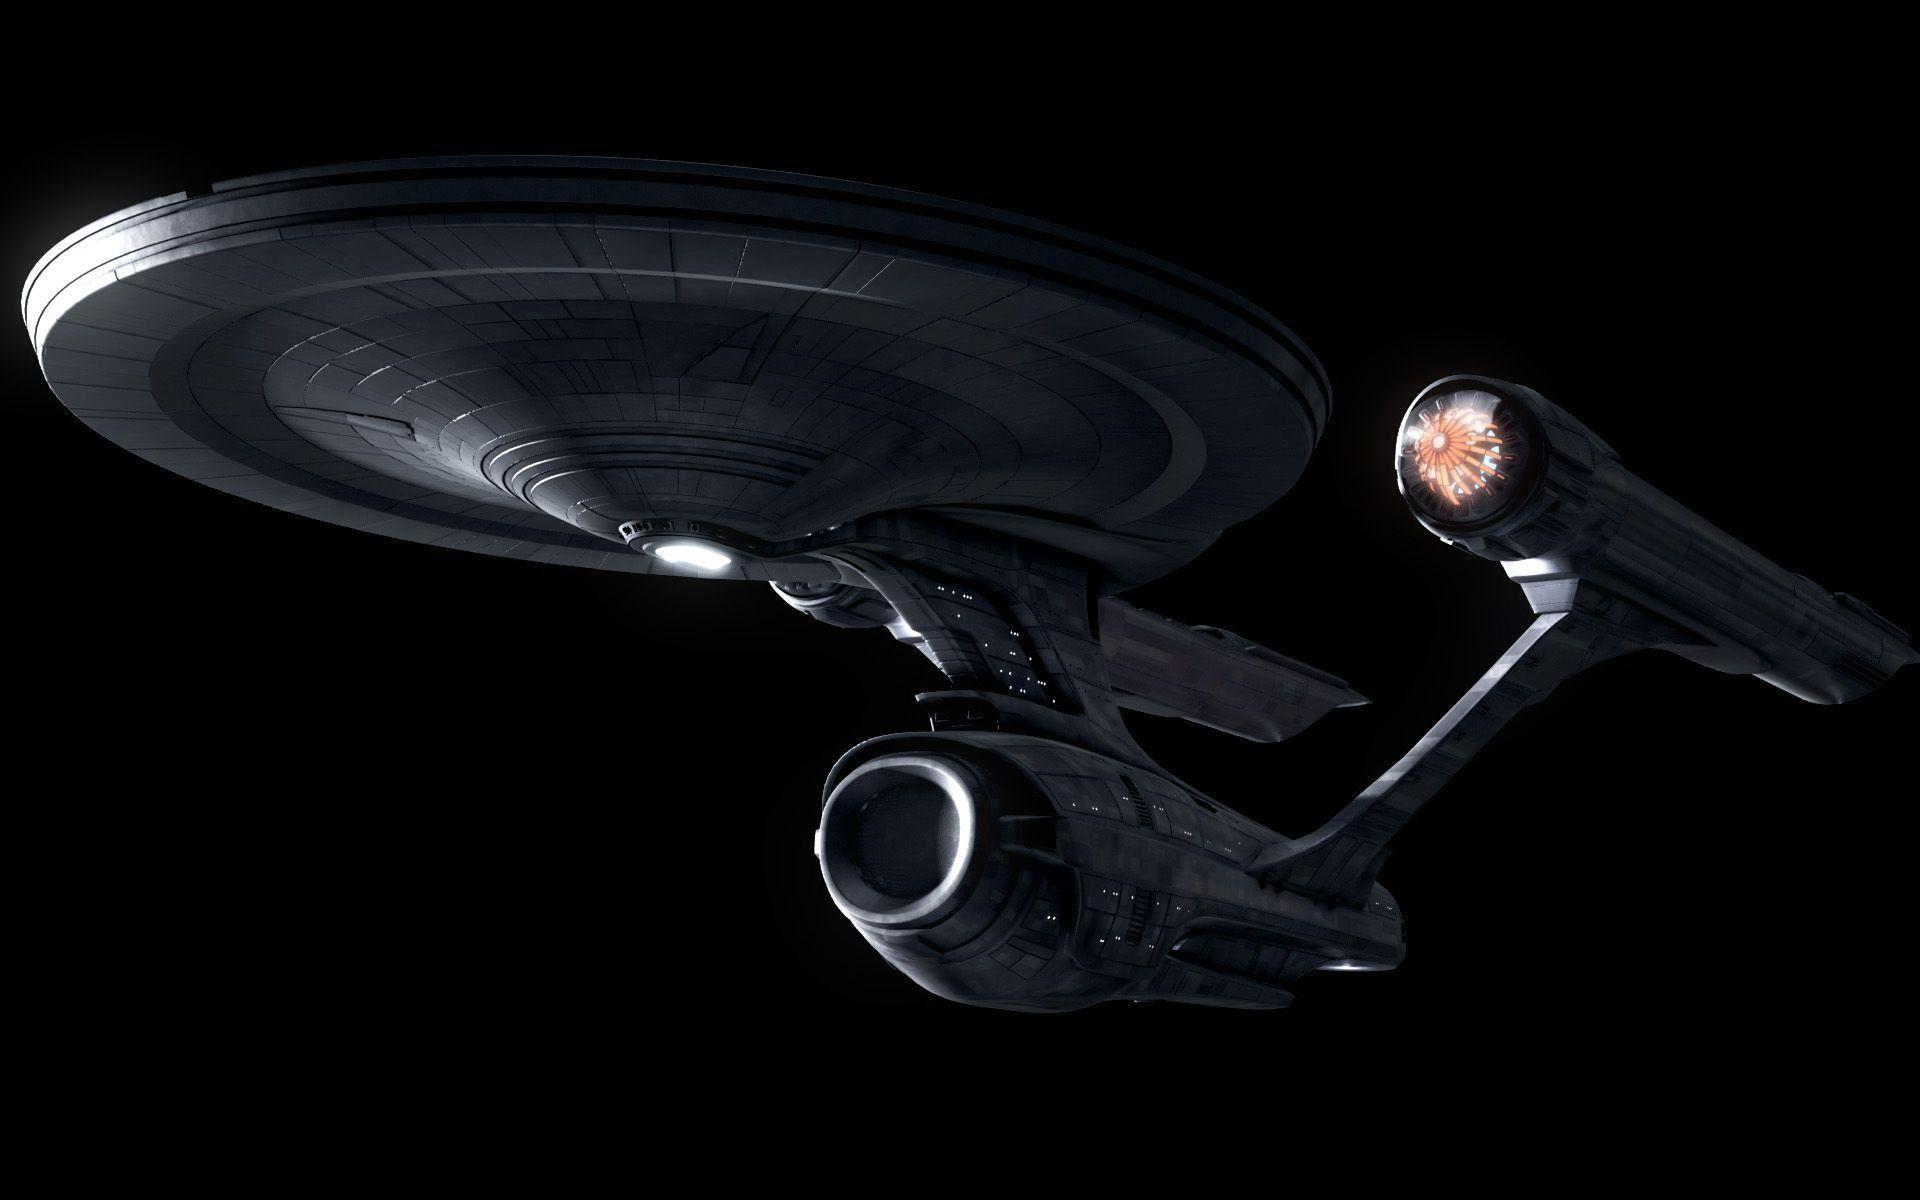 Star Trek HD Wallpapers - Wallpaper Cave